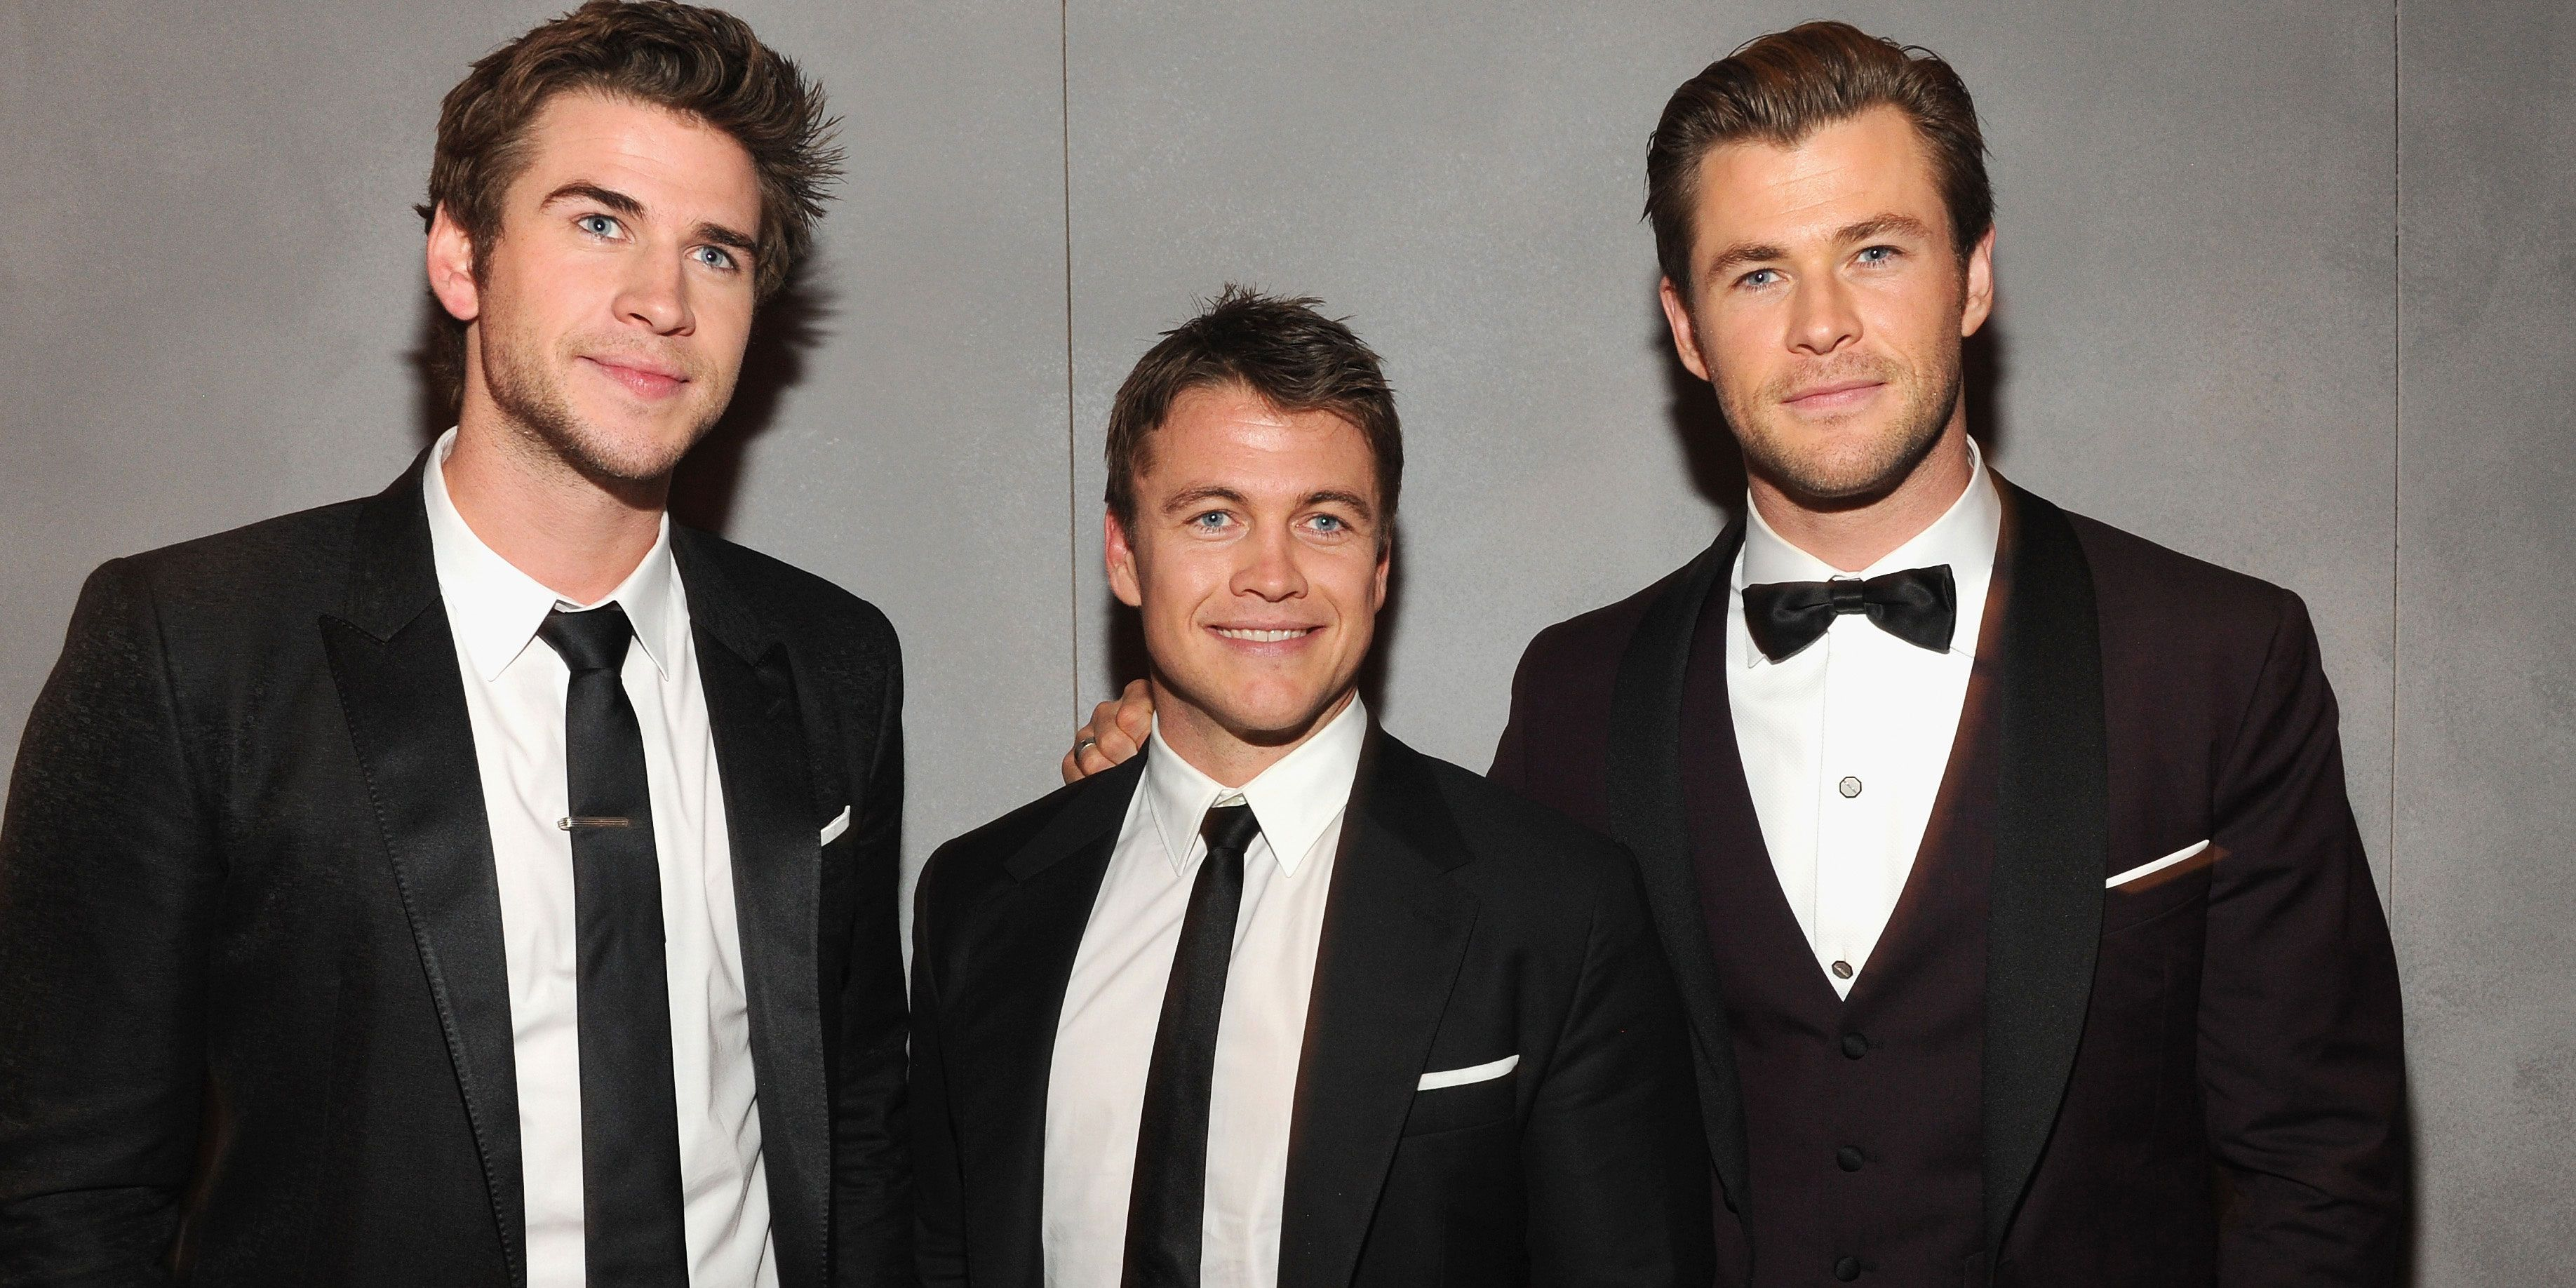 Who Is Luke Hemsworth? Liam and Chris Hemsworth's Brother Stars in Westworld Season 2